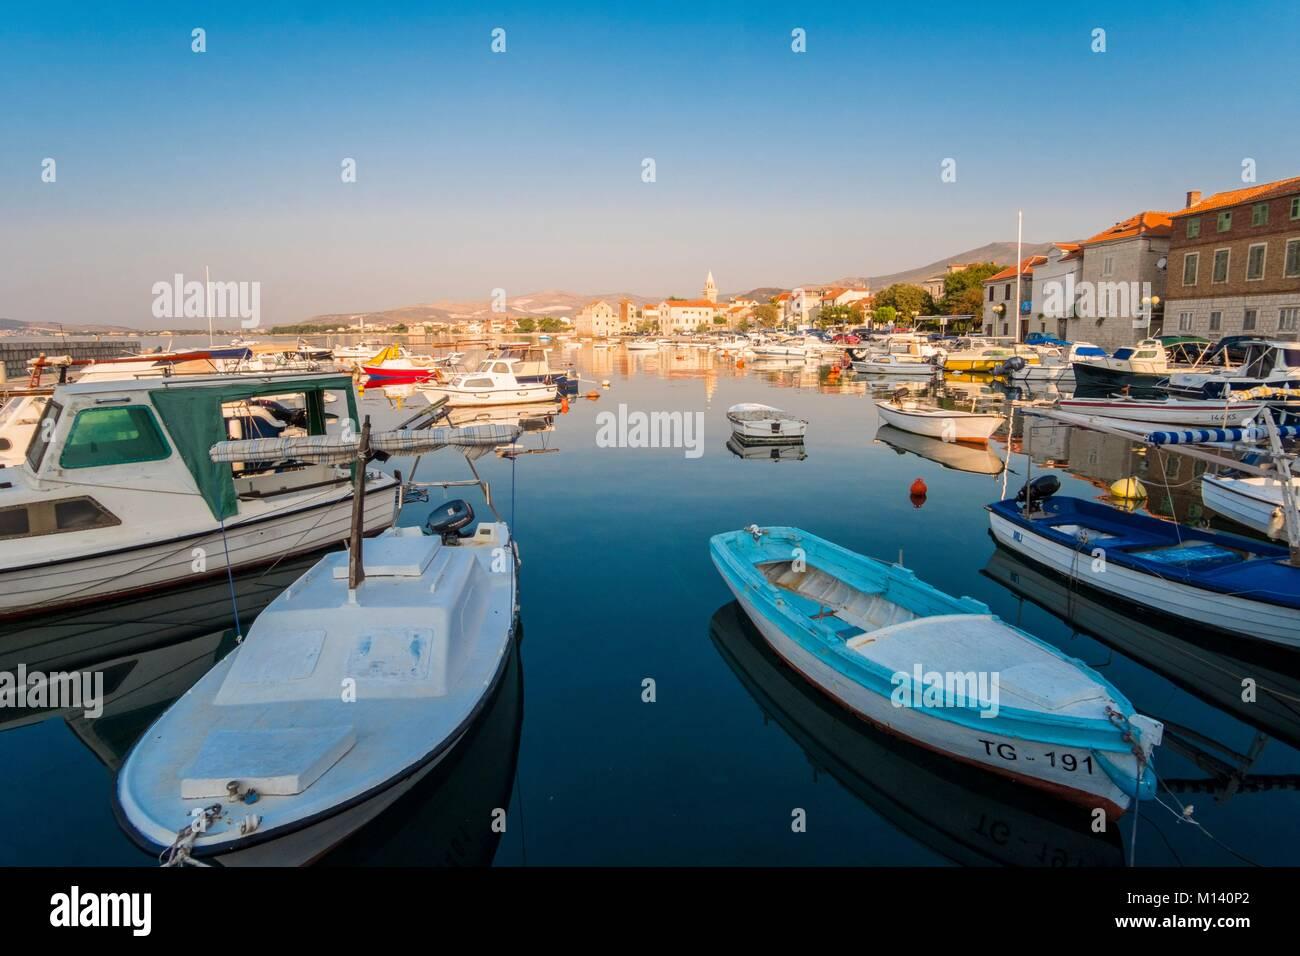 Croatia, North Dalmatia, Dalmatian coast, Zadar archipelago